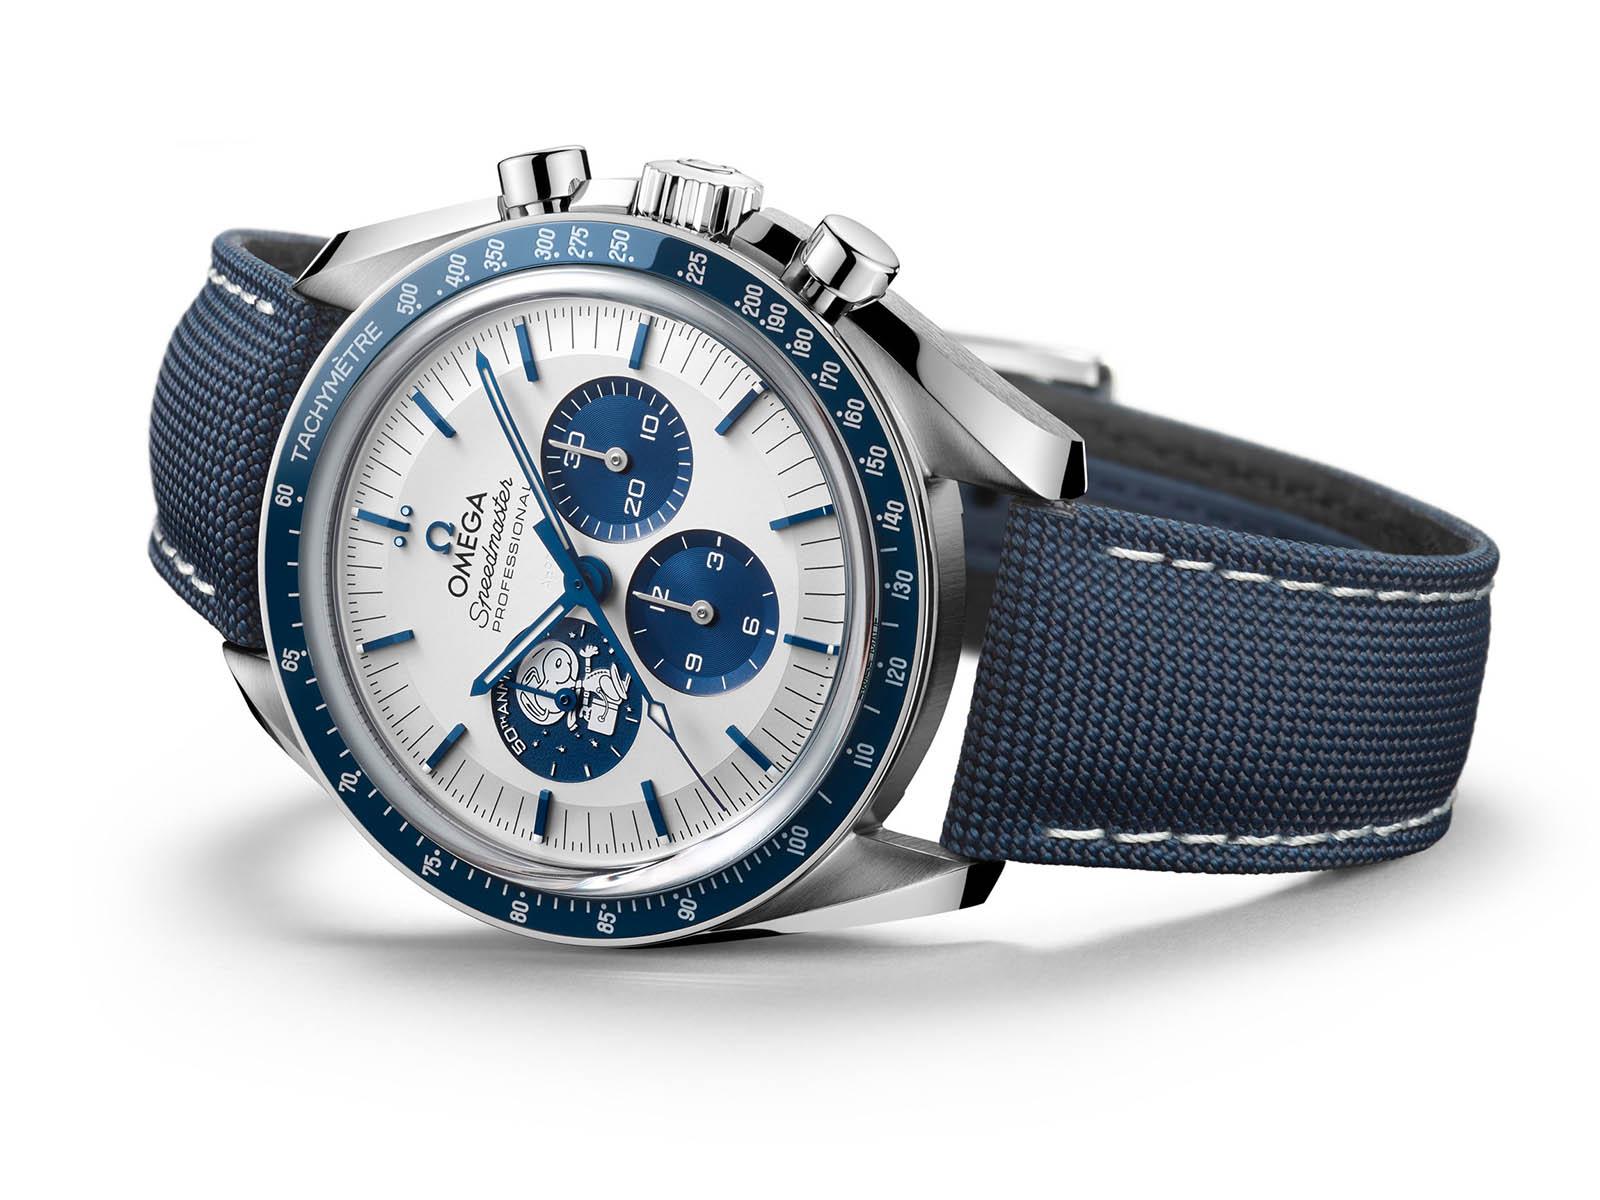 310-32-42-50-02-001-omega-speedmaster-silver-snoopy-award-50th-anniversary-7.jpg